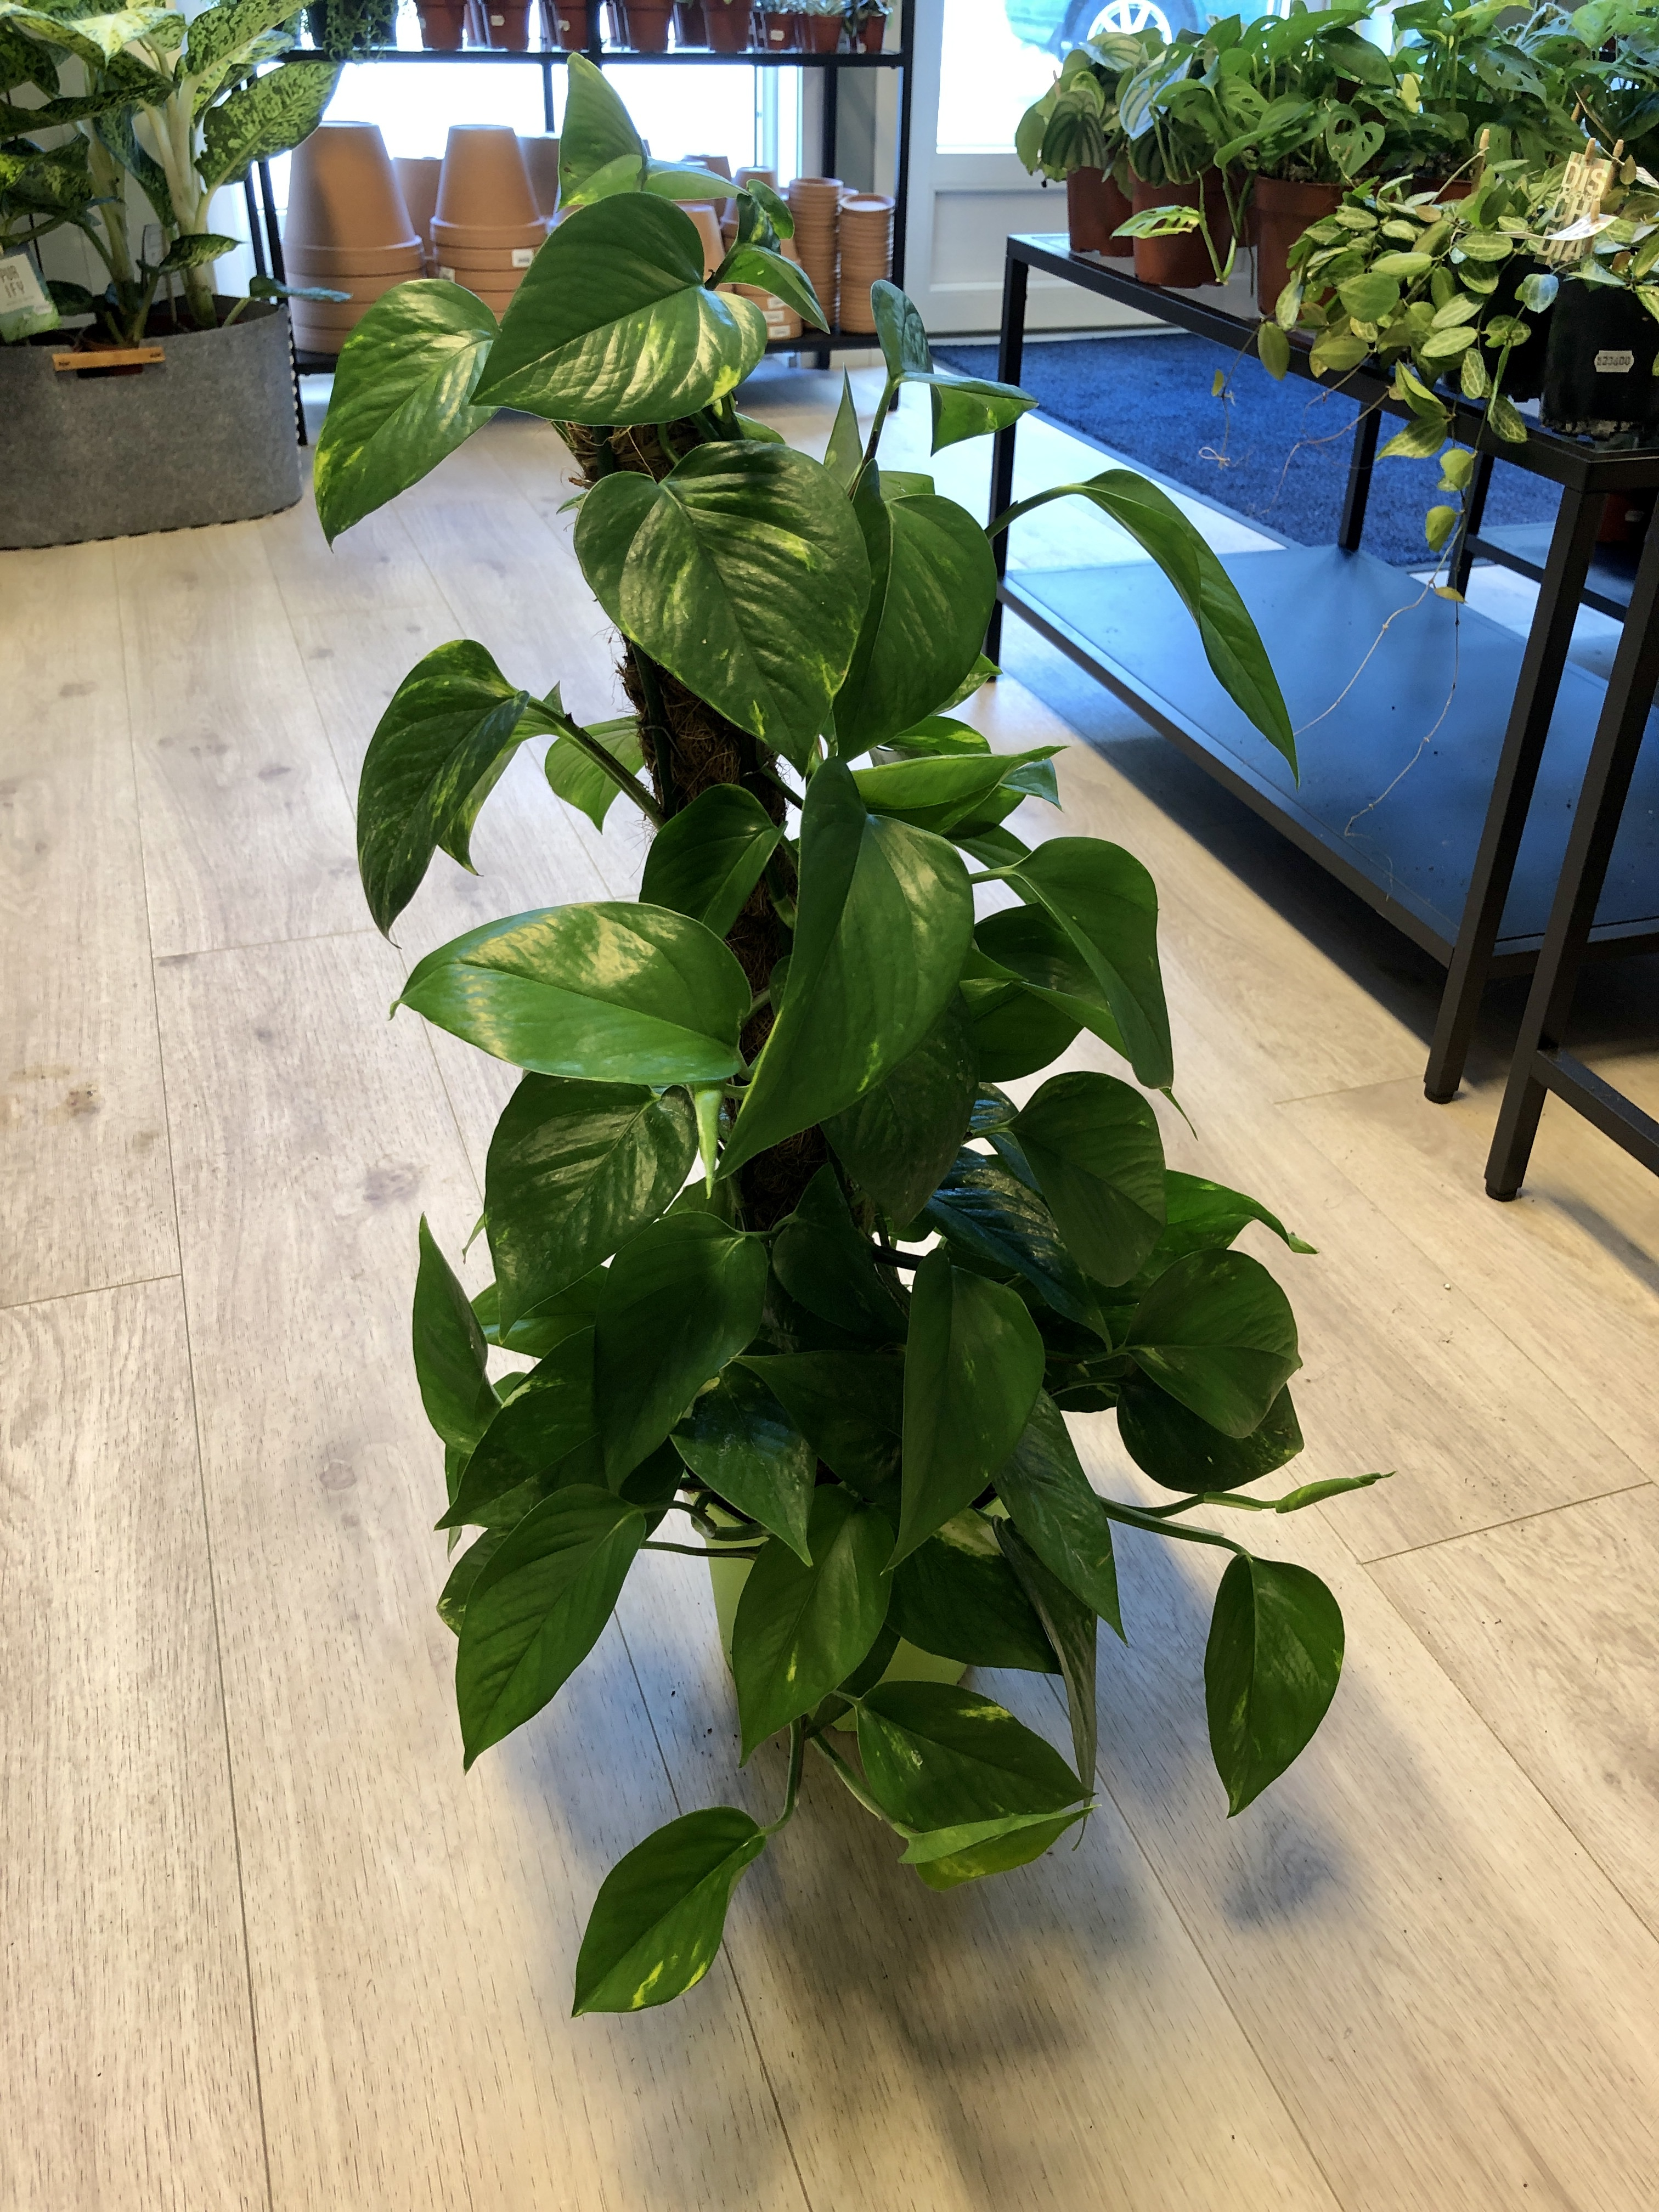 Epipremnum Pinnatum `Aureum` på mosestokk